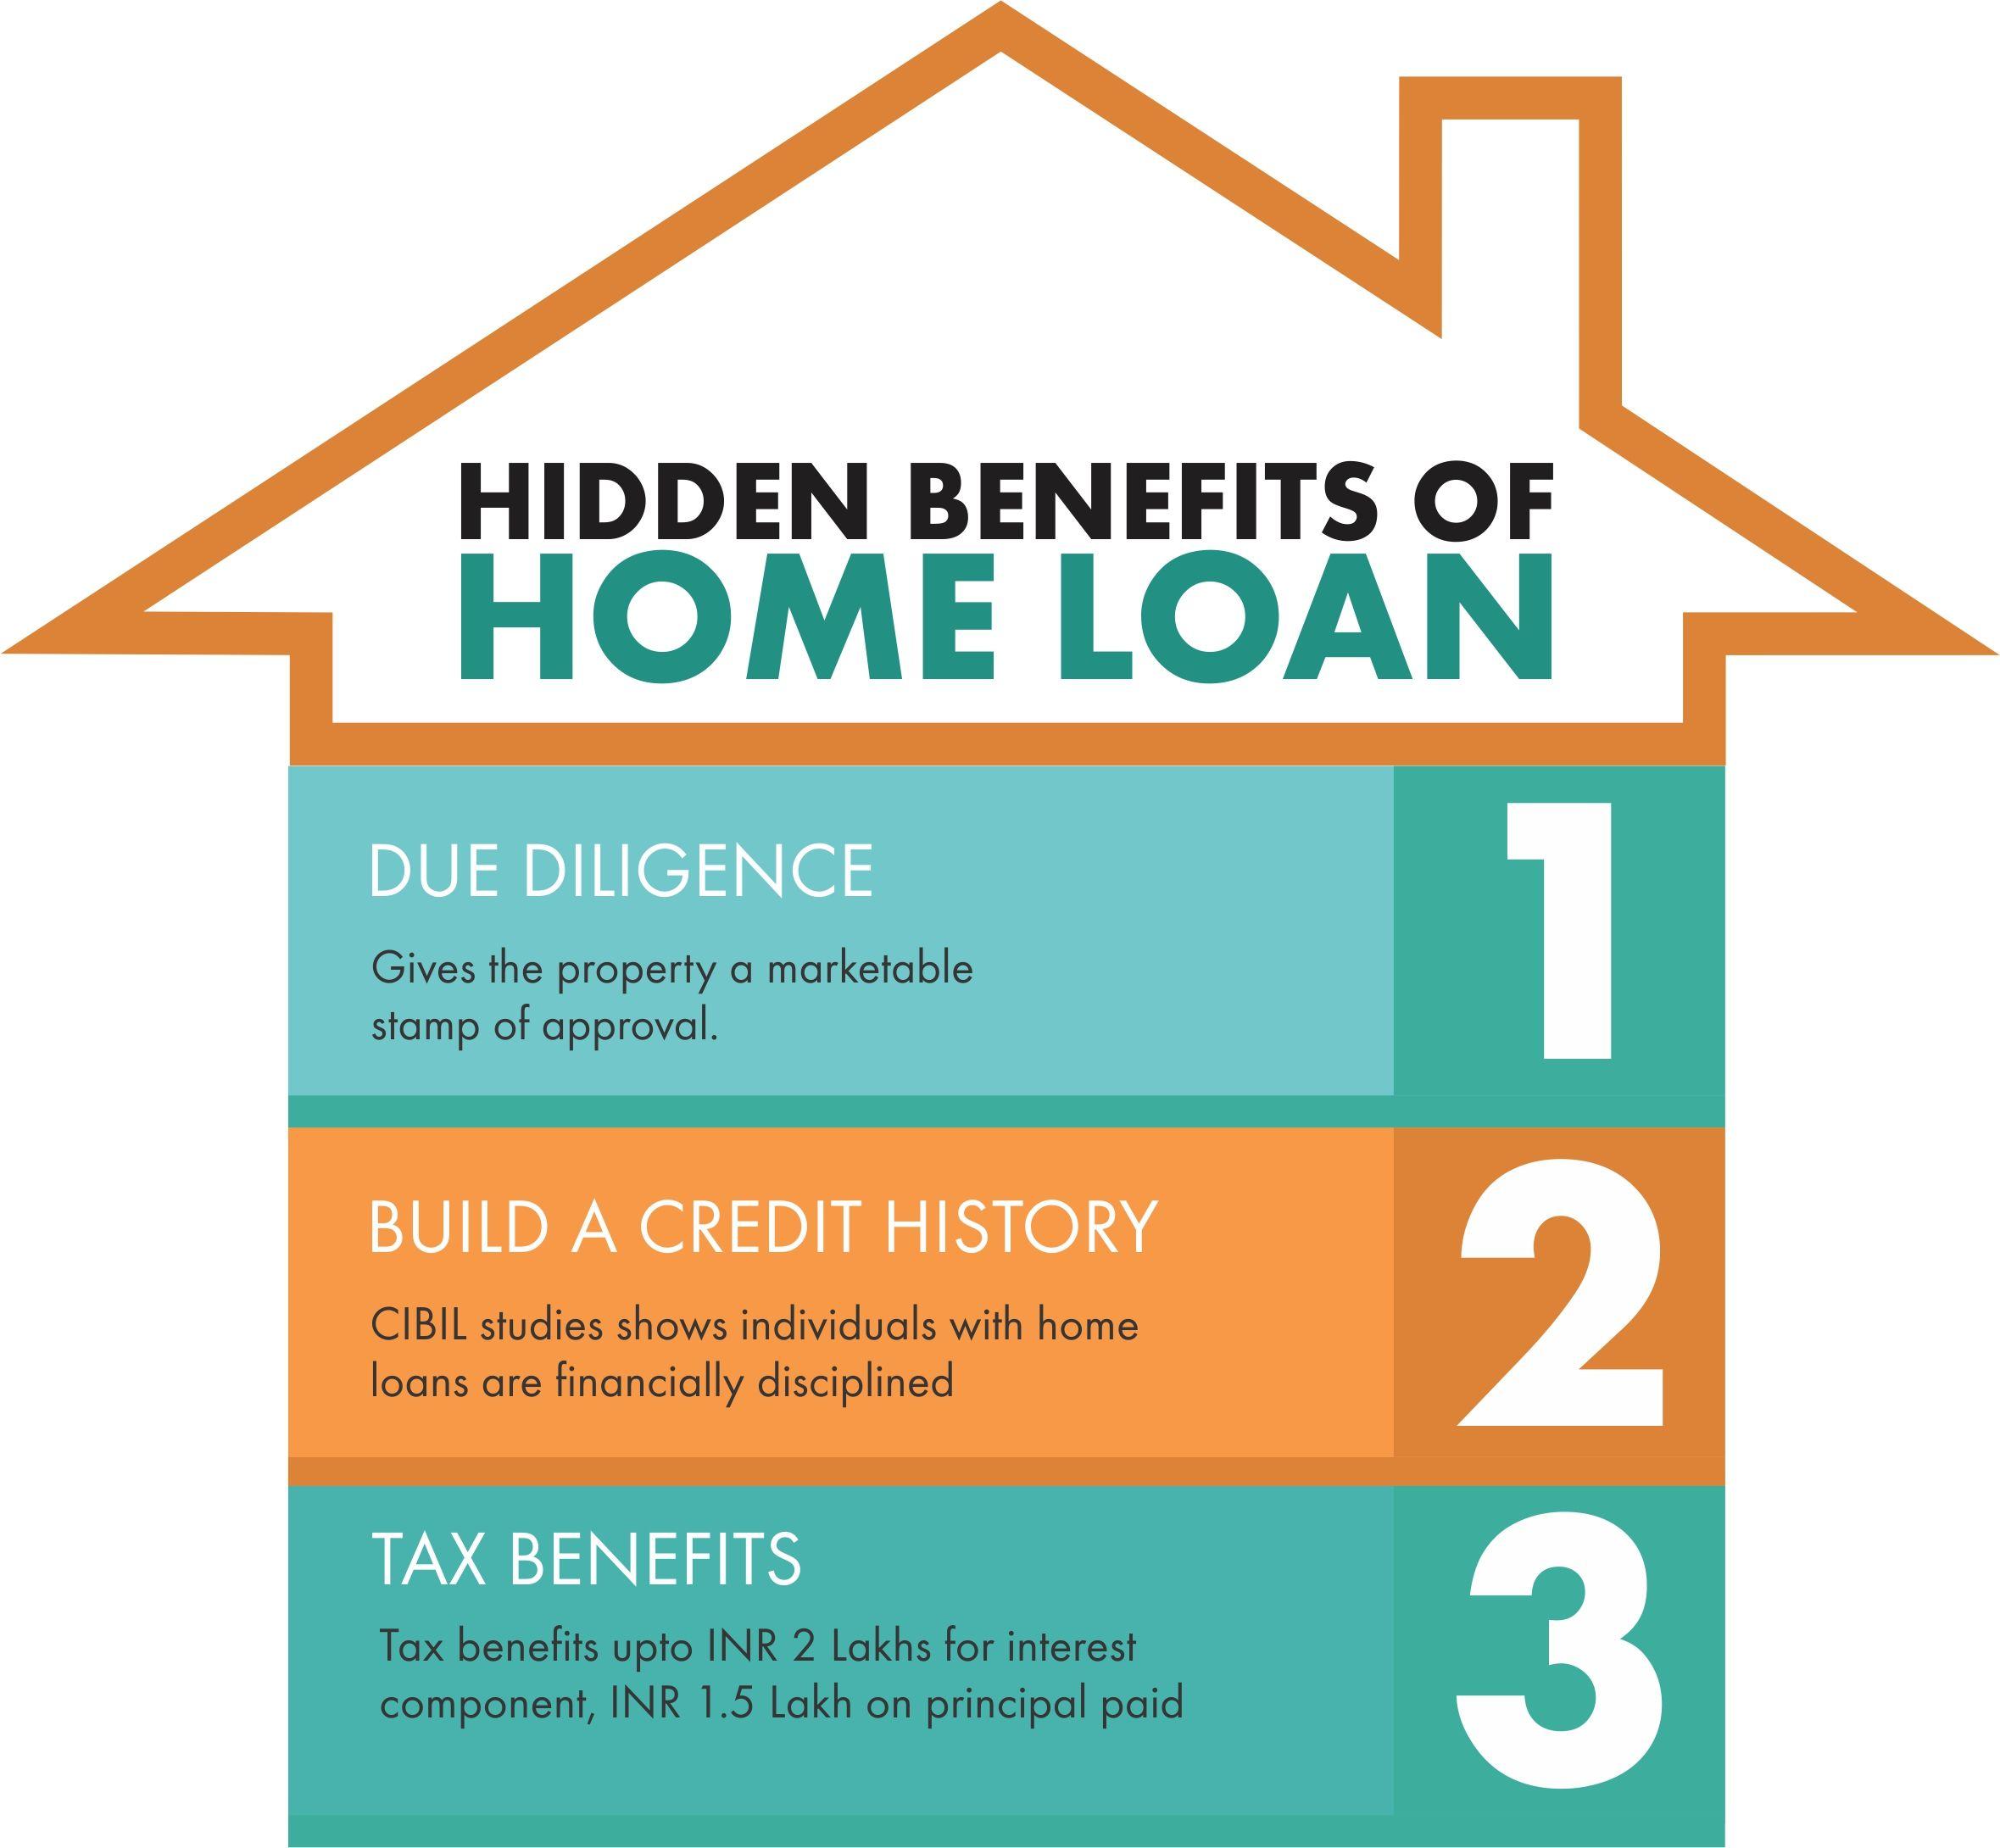 All Loan Home Loan Personal Loan Loan Against Property Business Loan Easy Loan Rate Off Interest Home Loan Easy Loans Home Renovation Loan Loan Rates